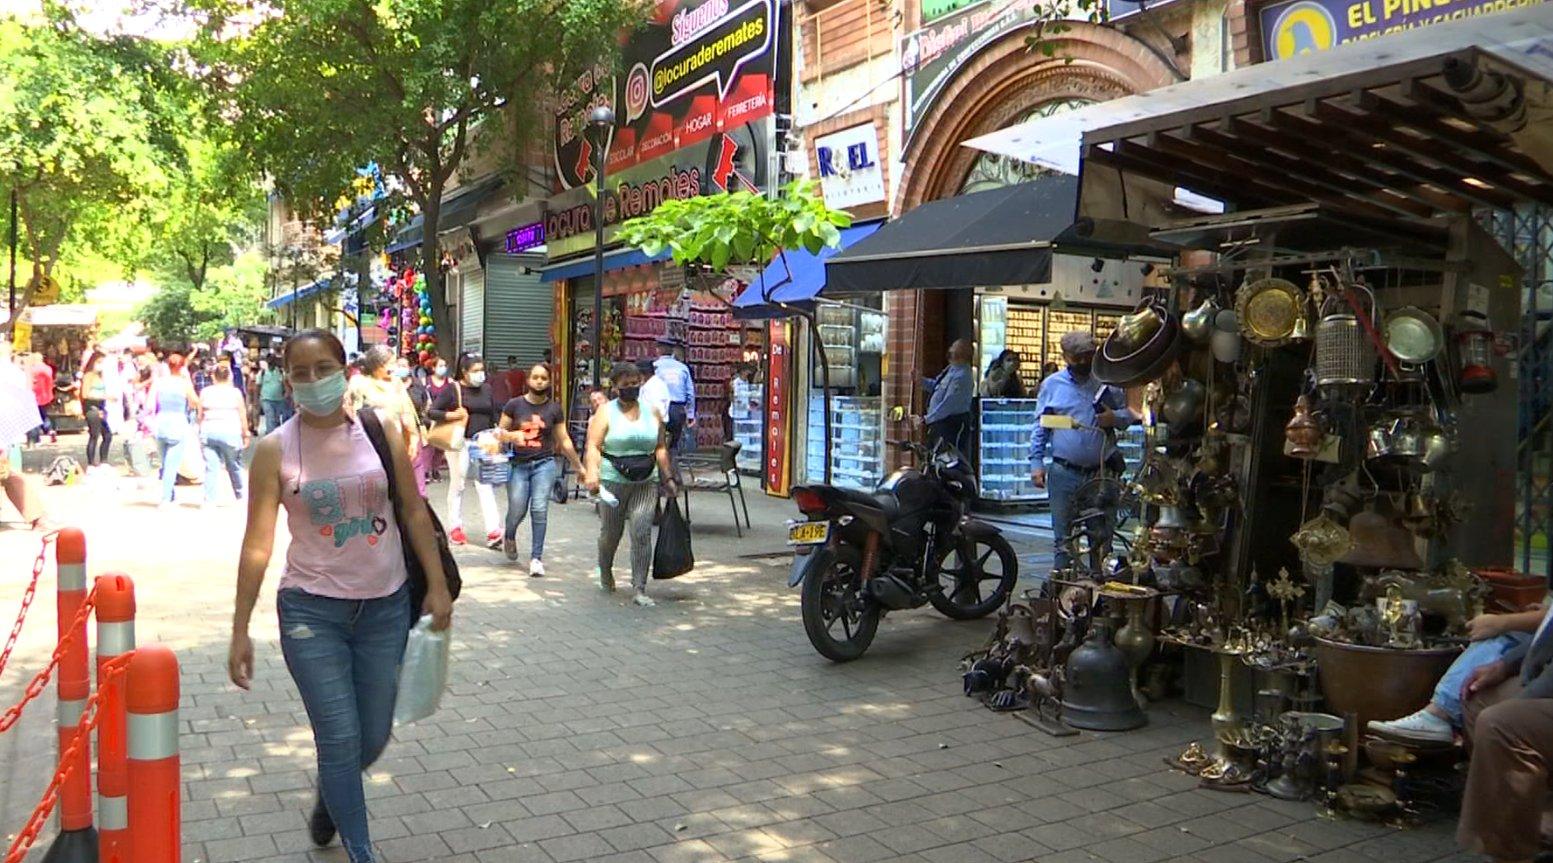 Comerciantes del Centro destacaron proceso de reactivación en Medellín